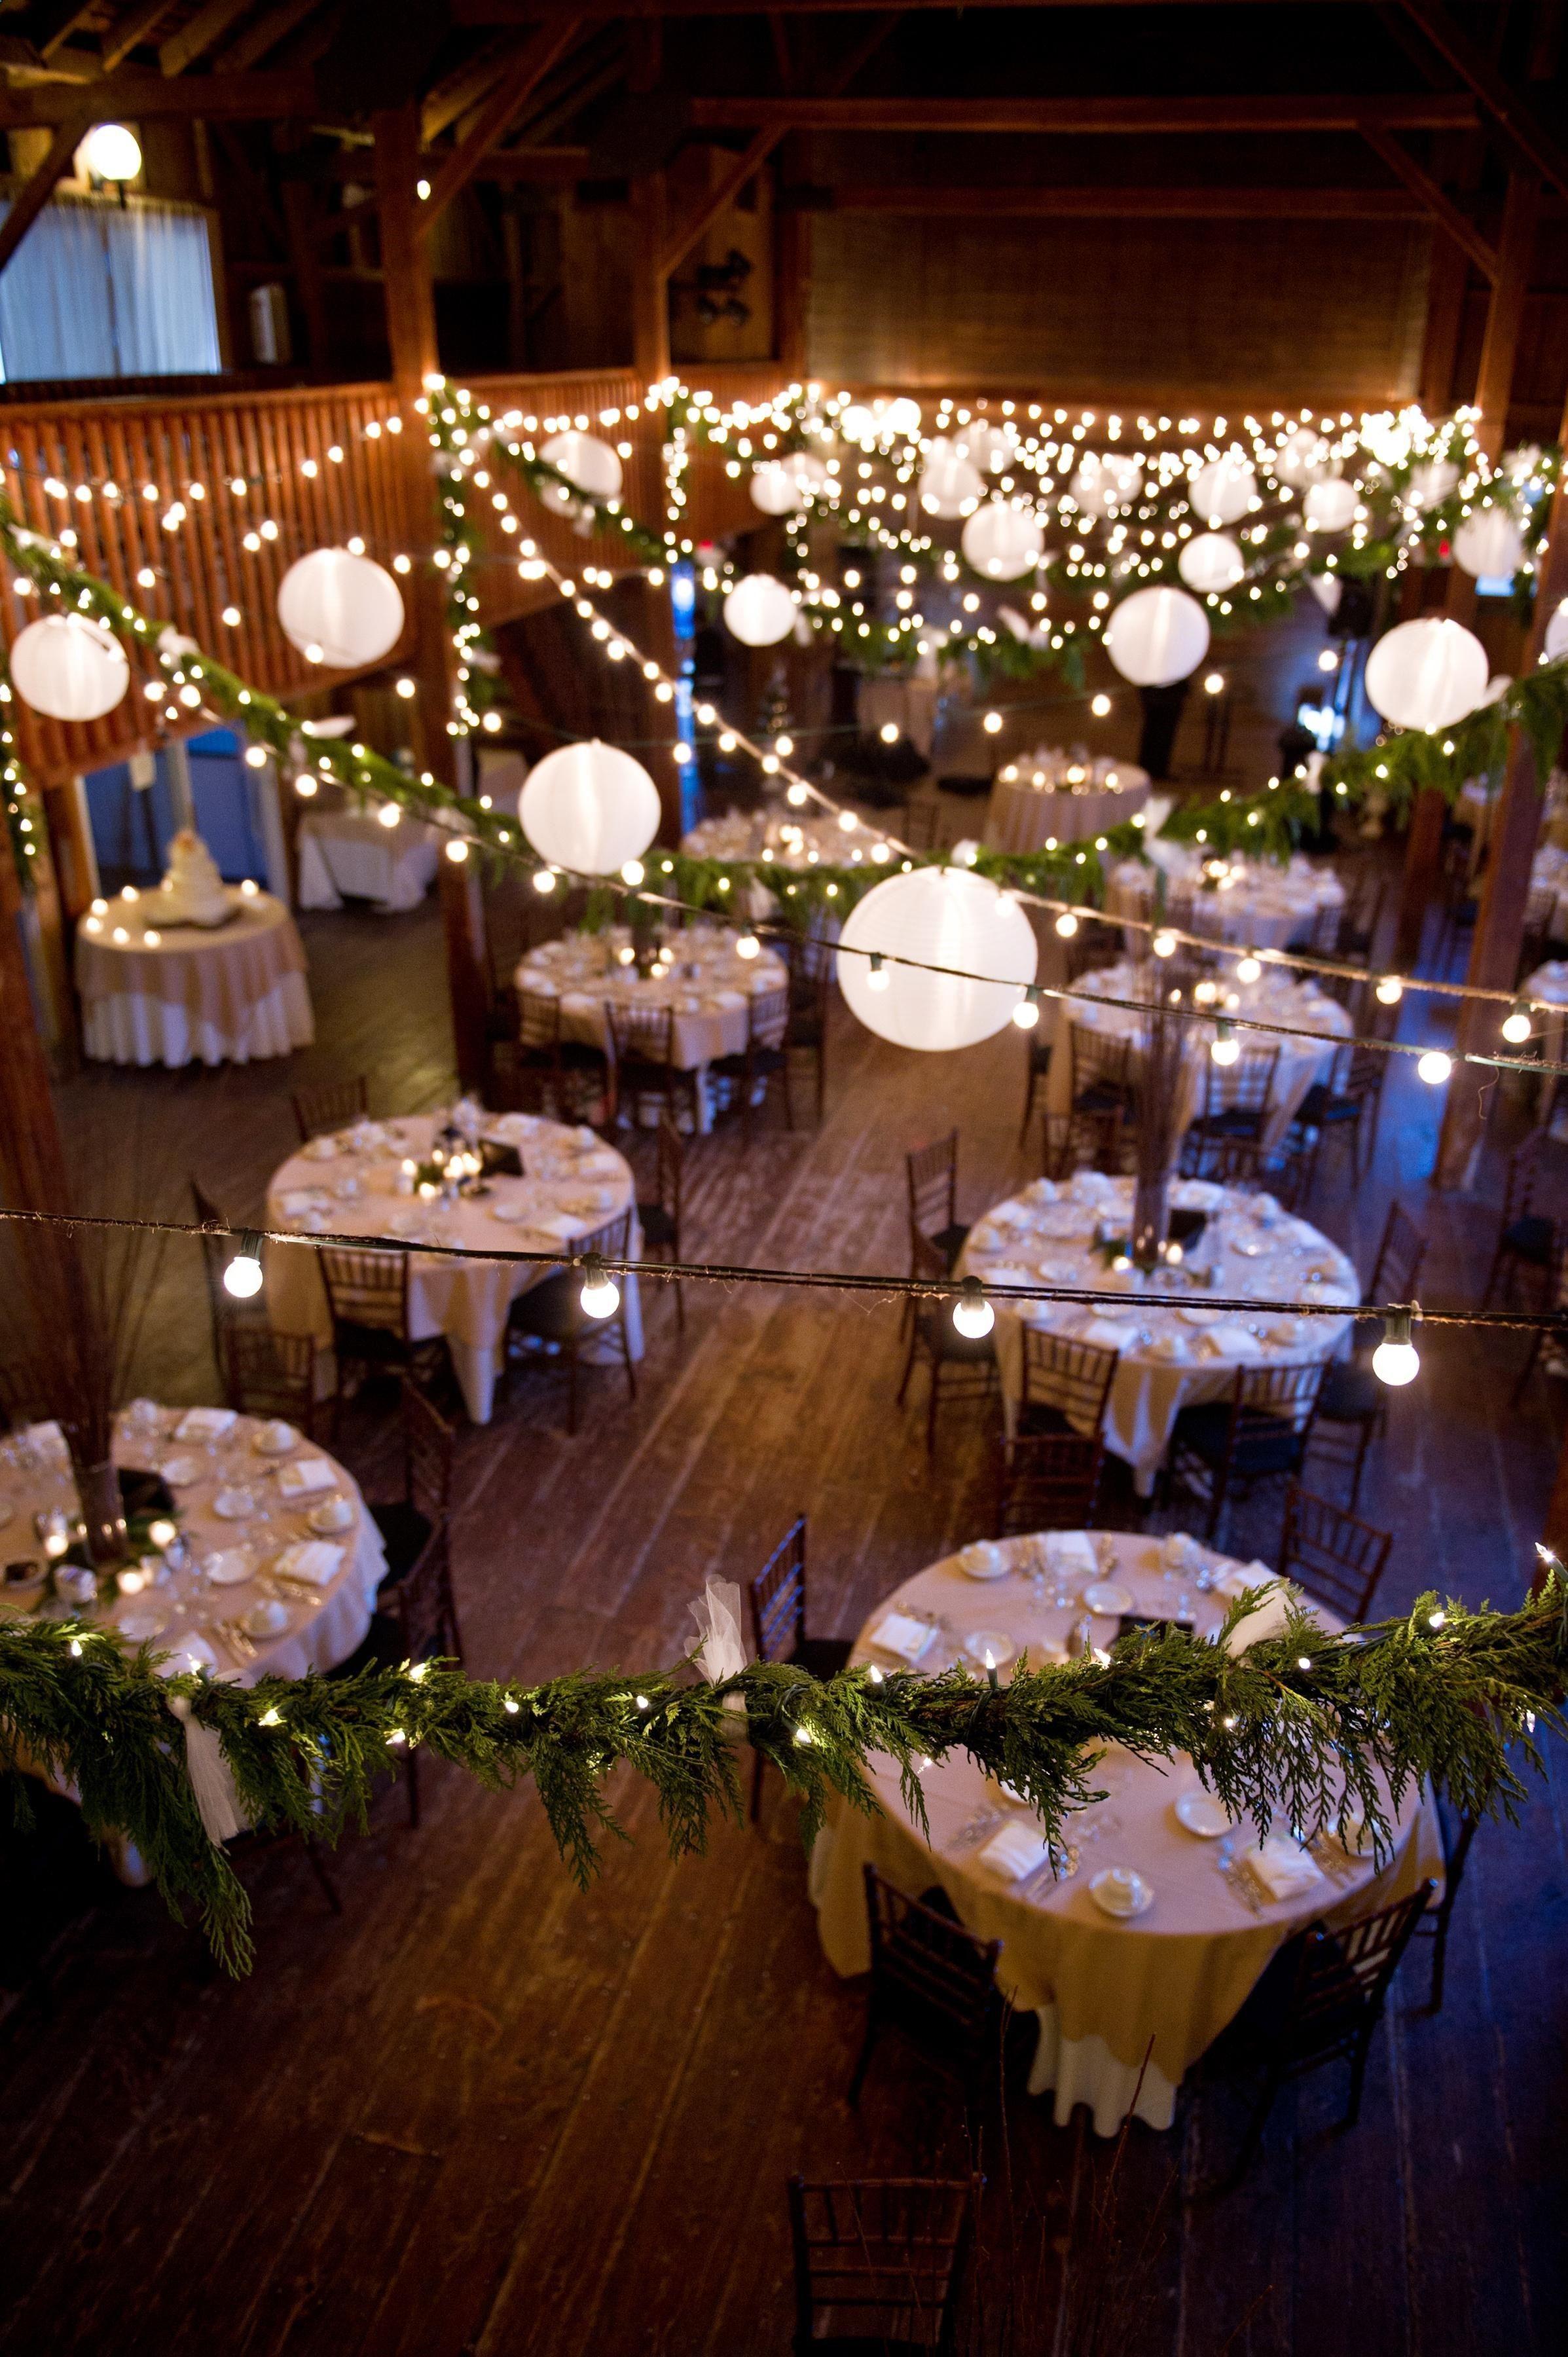 30 Smart Ways To Use Wedding Lights On Your Big Day Vintagewedding Wedding Decorations Wedding Lights Diy Wedding Decorations